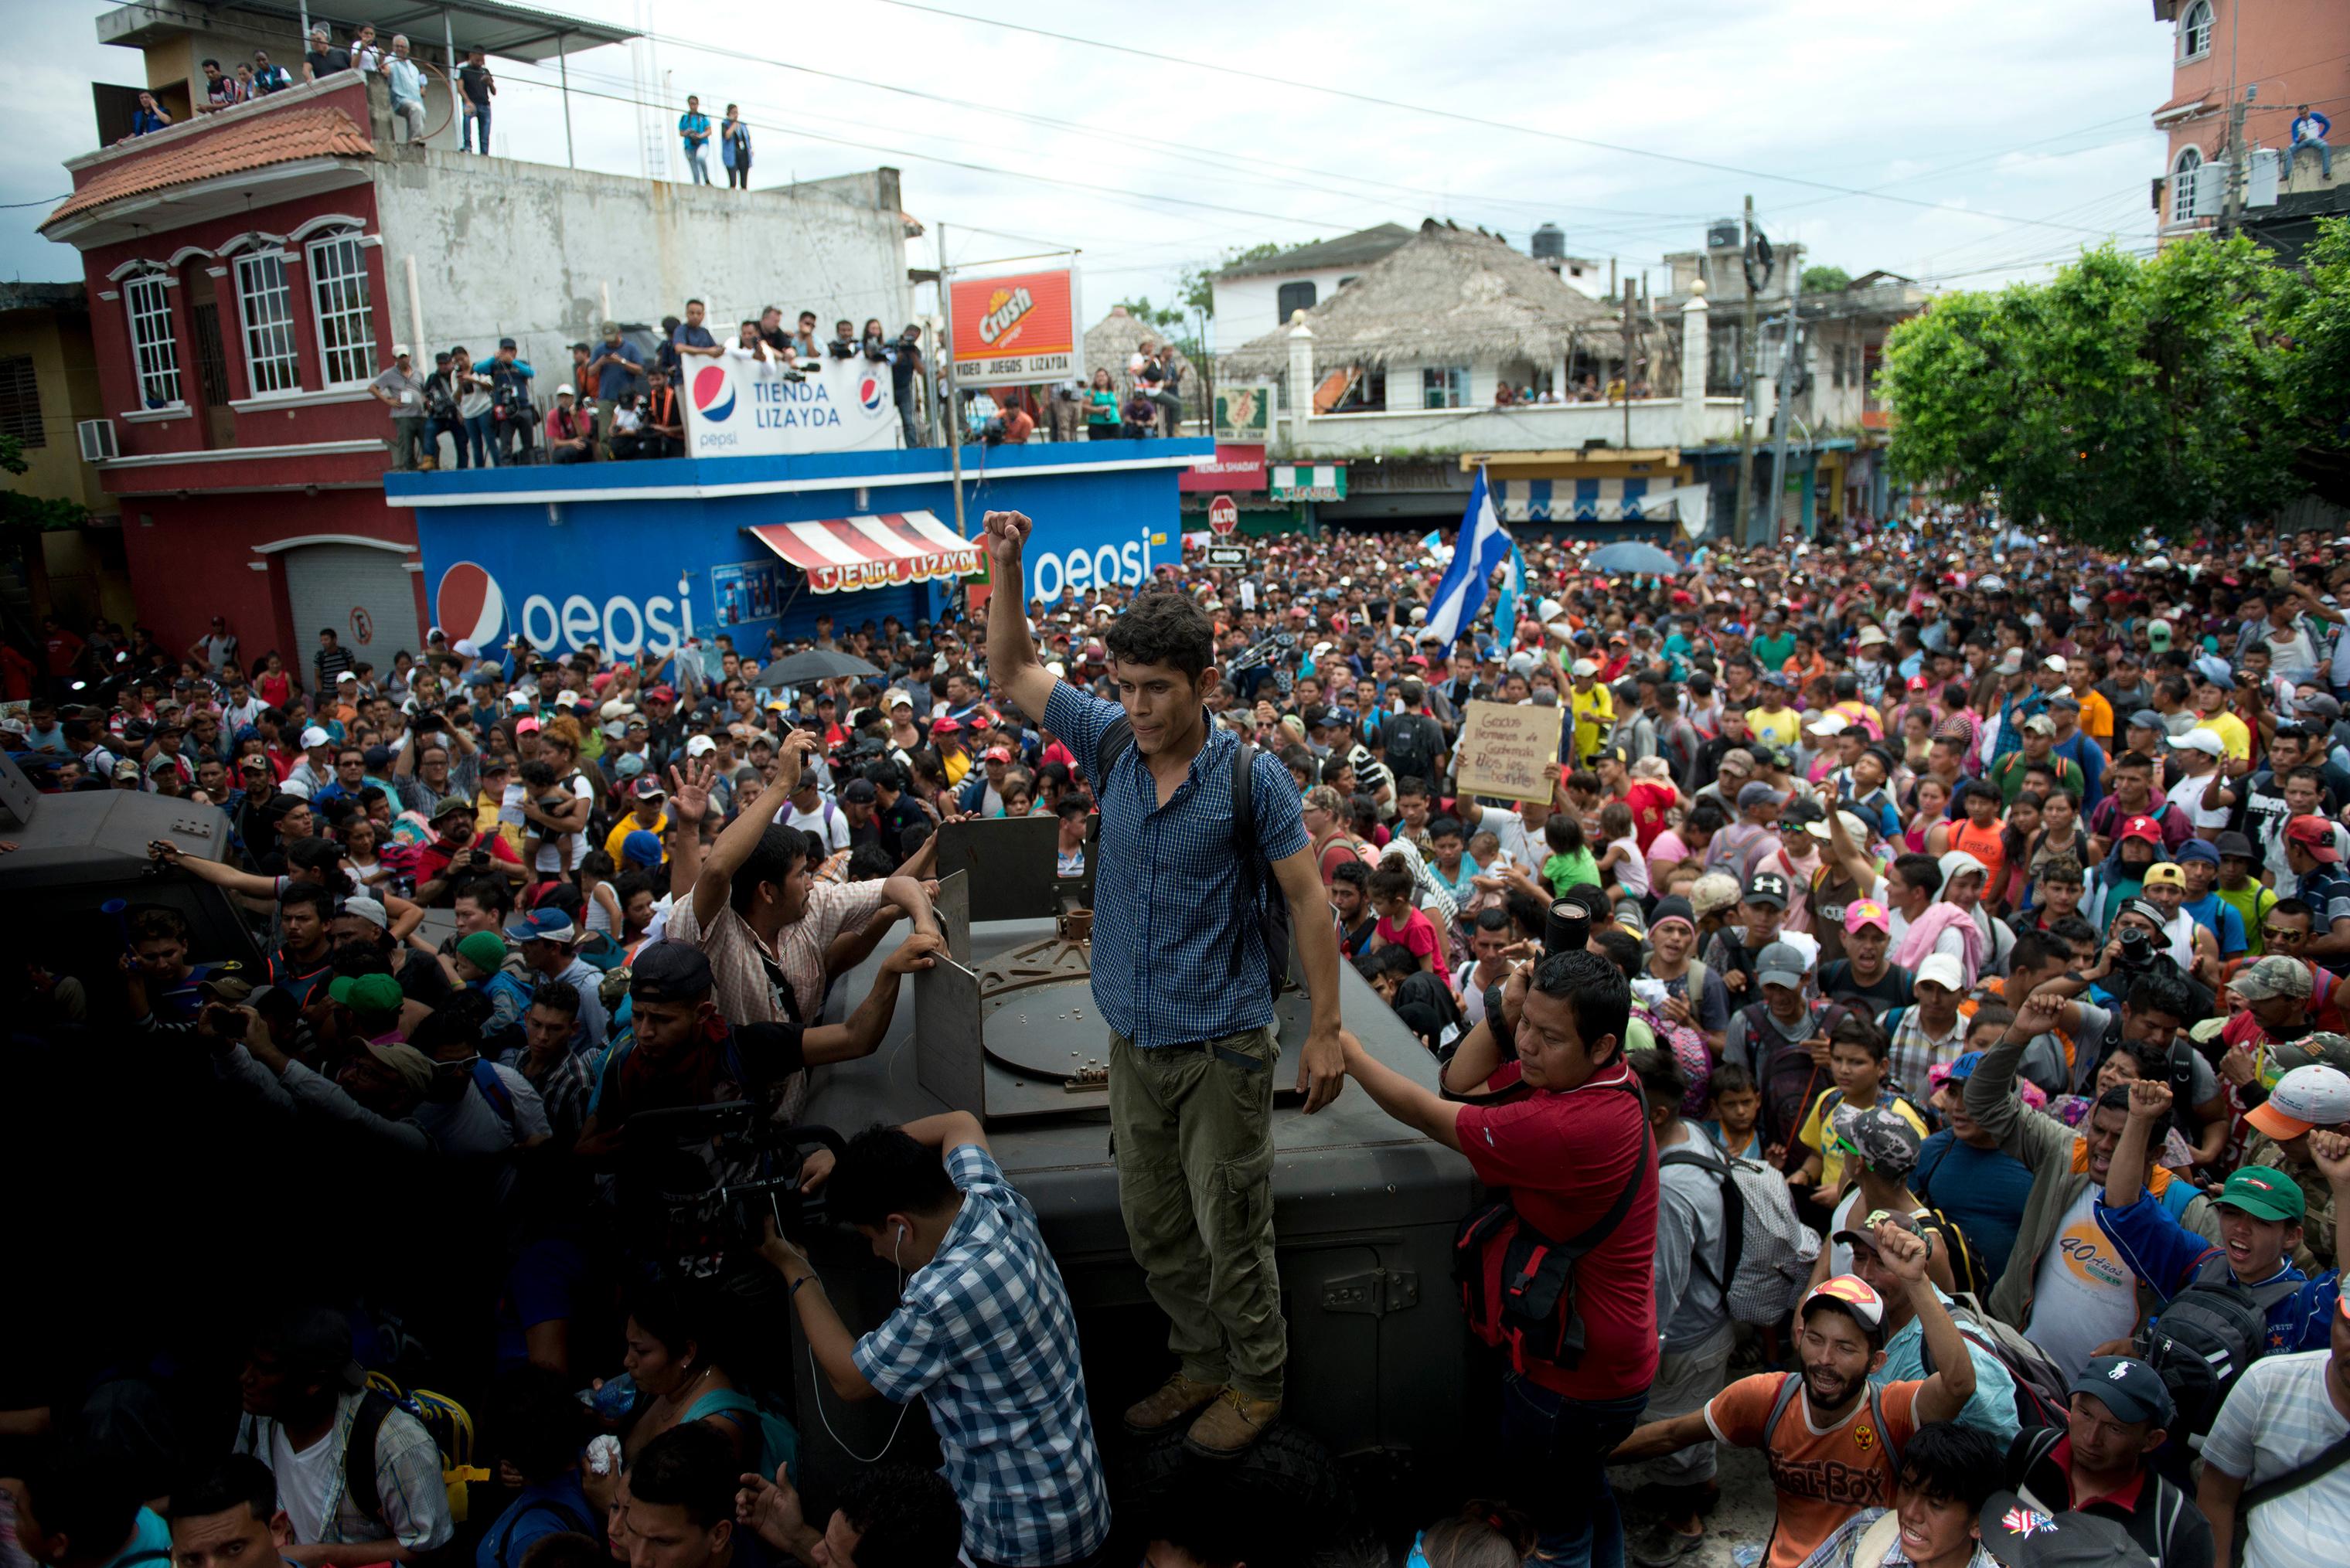 Thousands of Honduran migrants stream towards the border bridge in Tecun Uman, Guatemala, on Oct. 19.